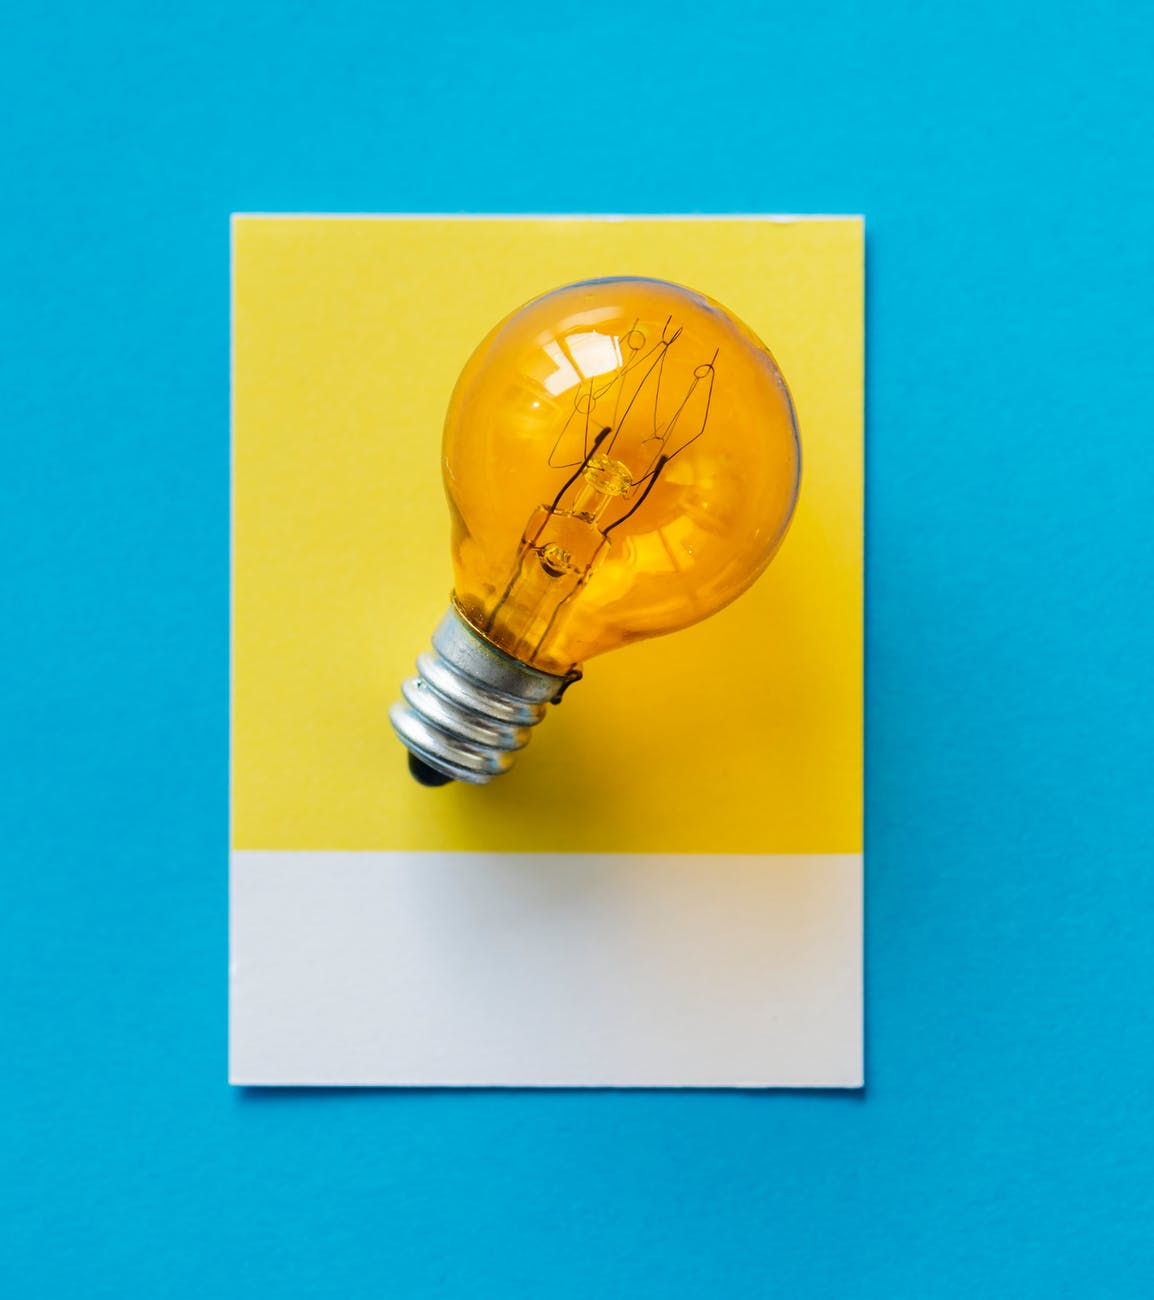 photo of yellow light bulb